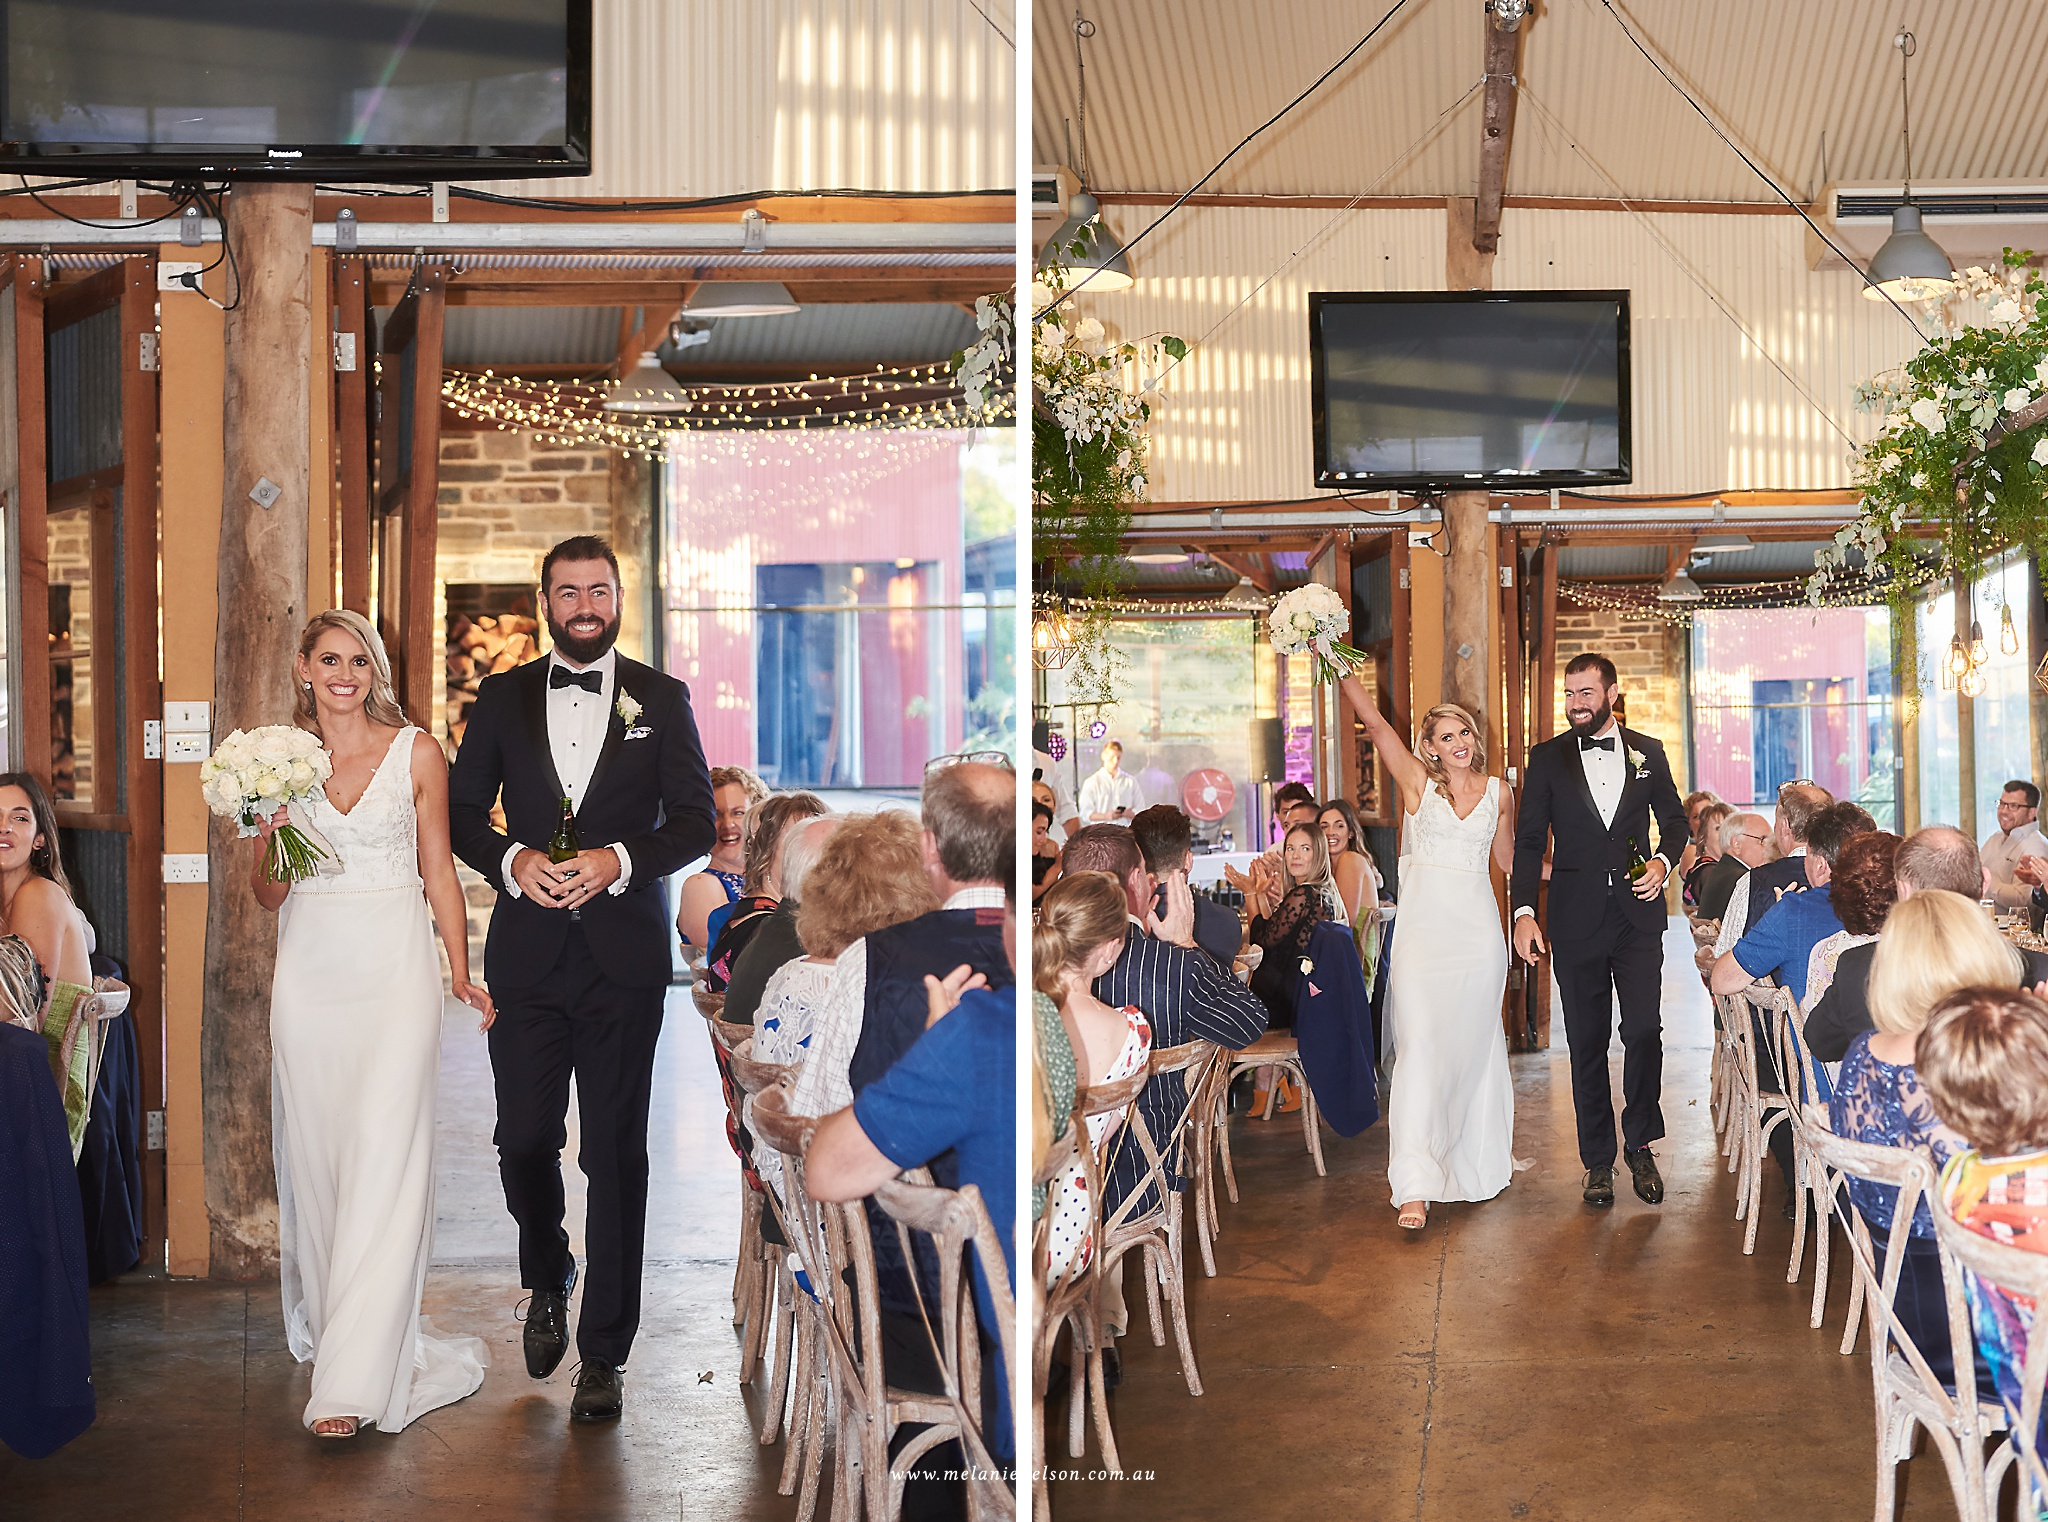 longview_vineyard_wedding_0088.jpg